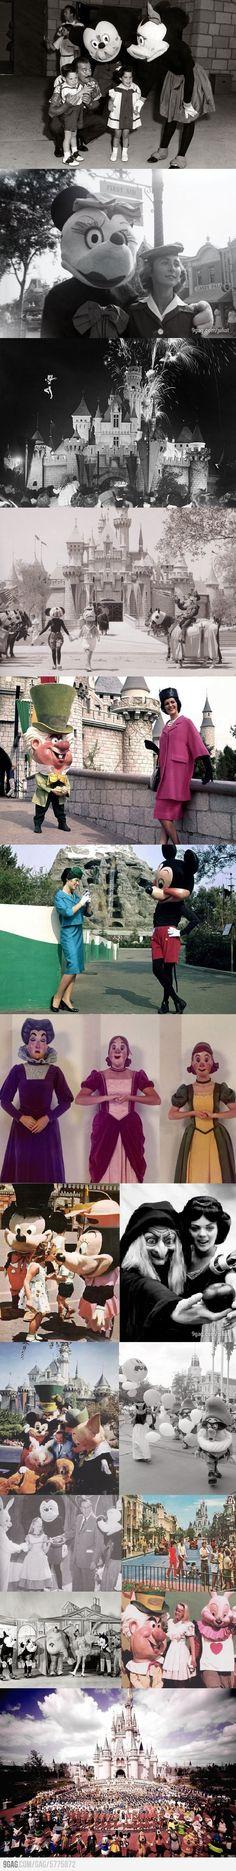 Old photos from Disneyland & Walt Disney World Disney Parks, Disney Nerd, Disney Theme, Disney Love, Disney Fanatic, Disney Addict, Retro Disney, Old Disney, Disney And Dreamworks